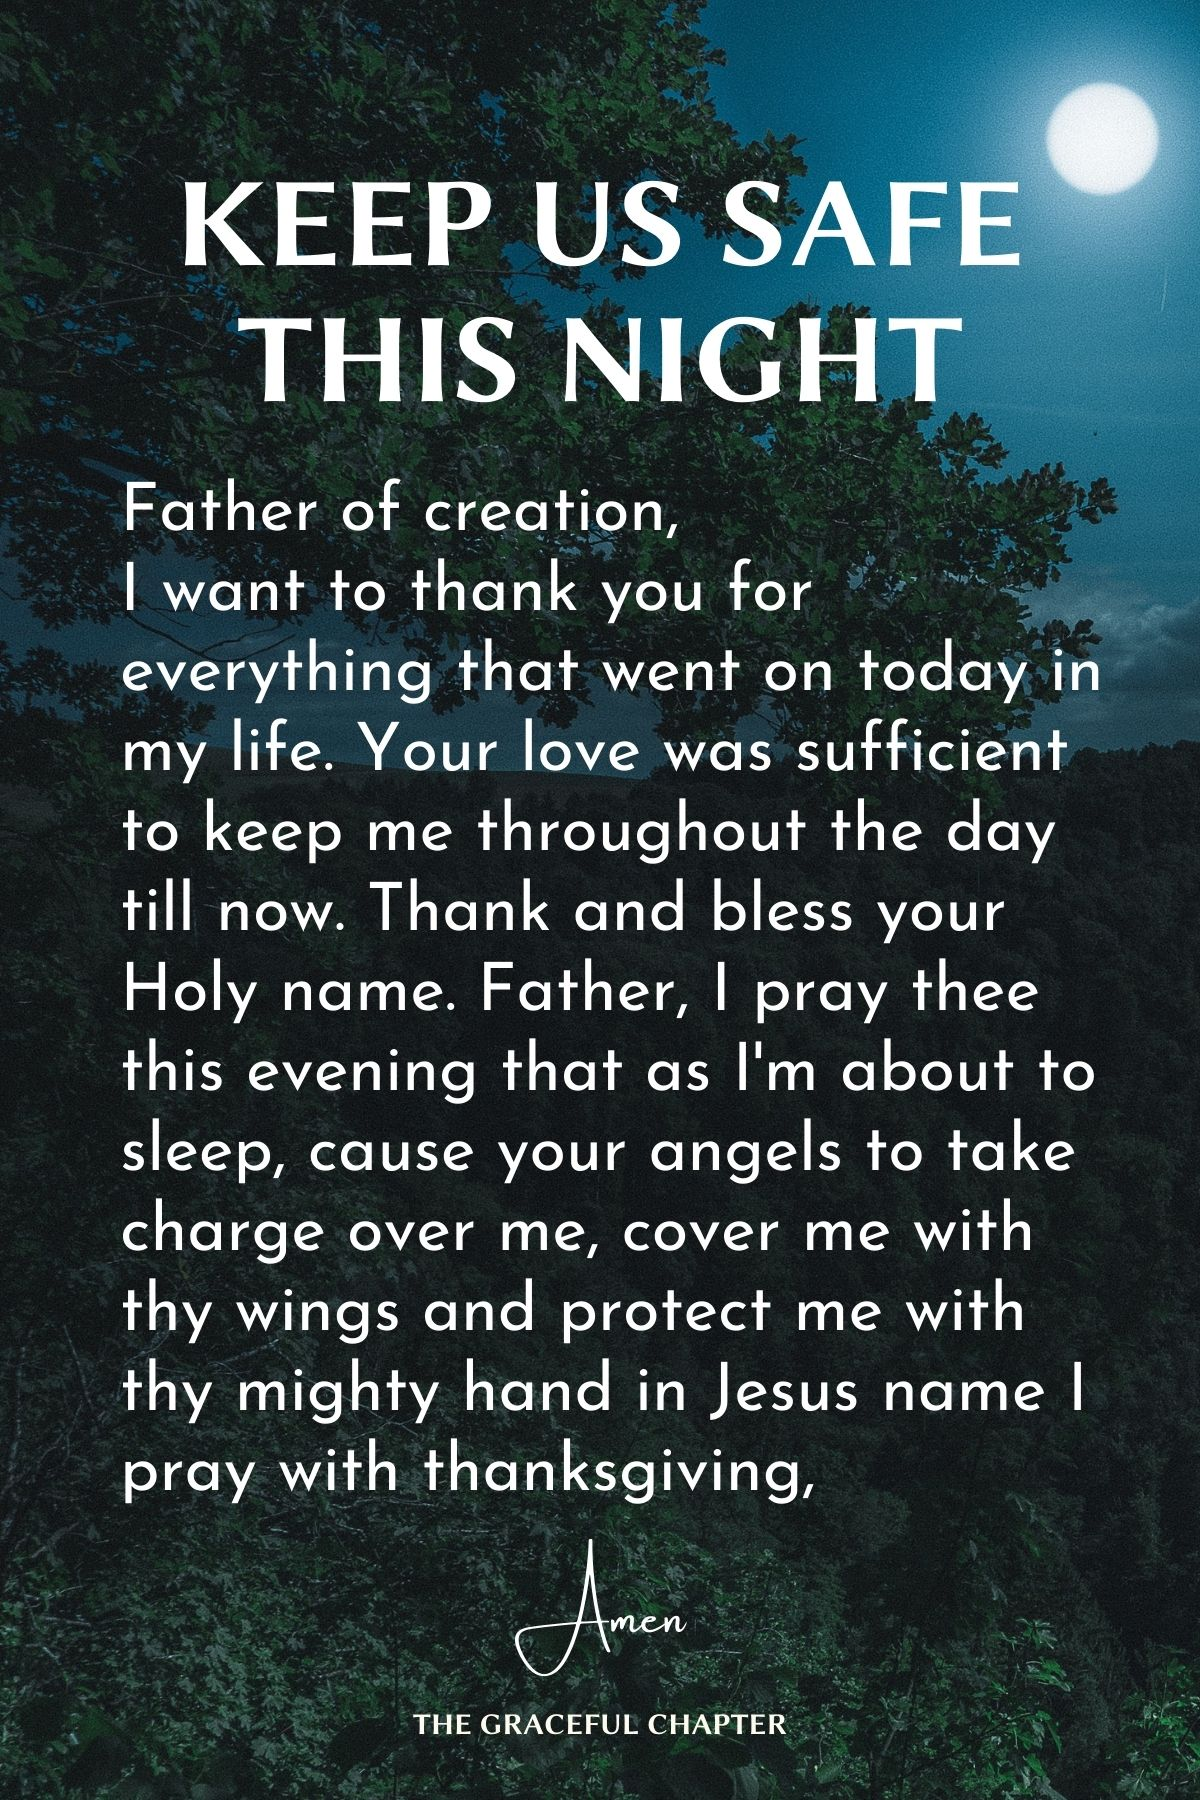 Keep us safe this night